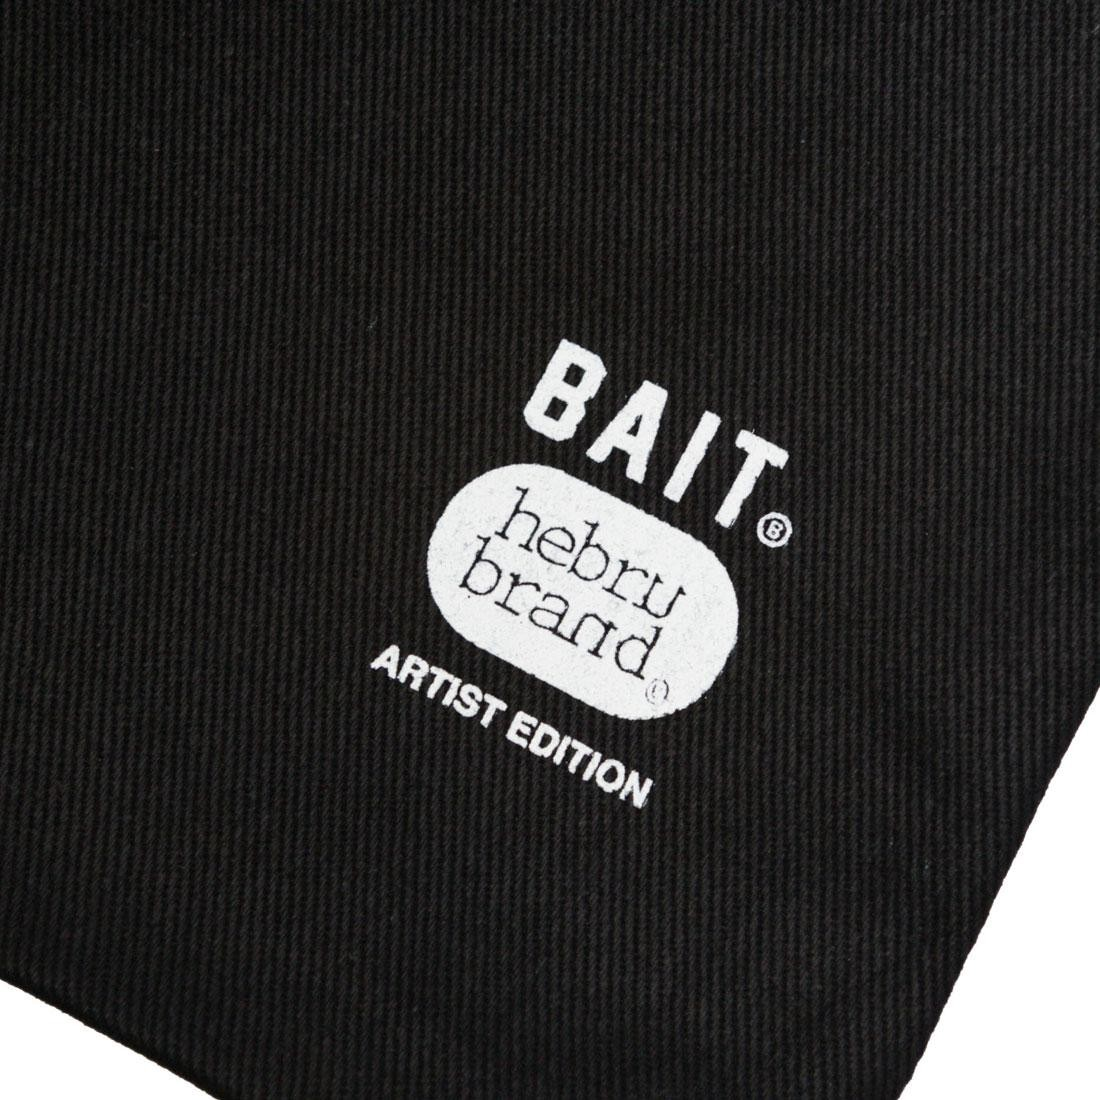 【SALE】BAIT HEBRU FLY BOY TOTE - BAHEBRUCCTOTE